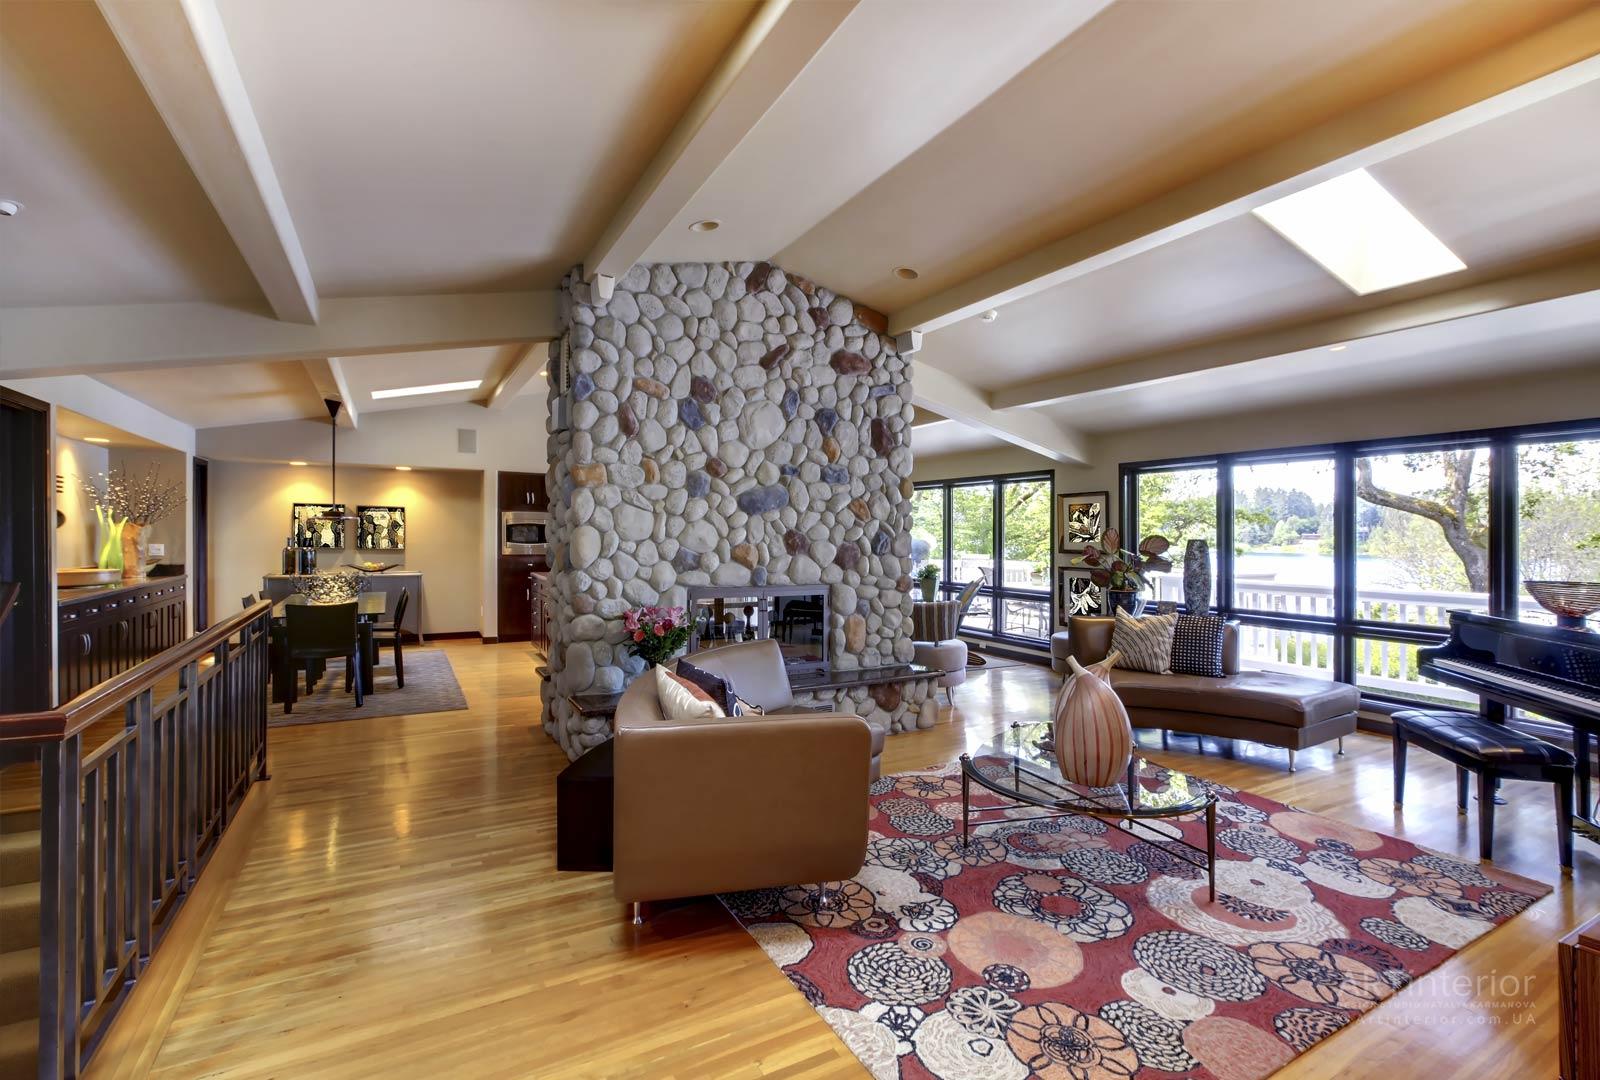 country house living room design ideas. Black Bedroom Furniture Sets. Home Design Ideas